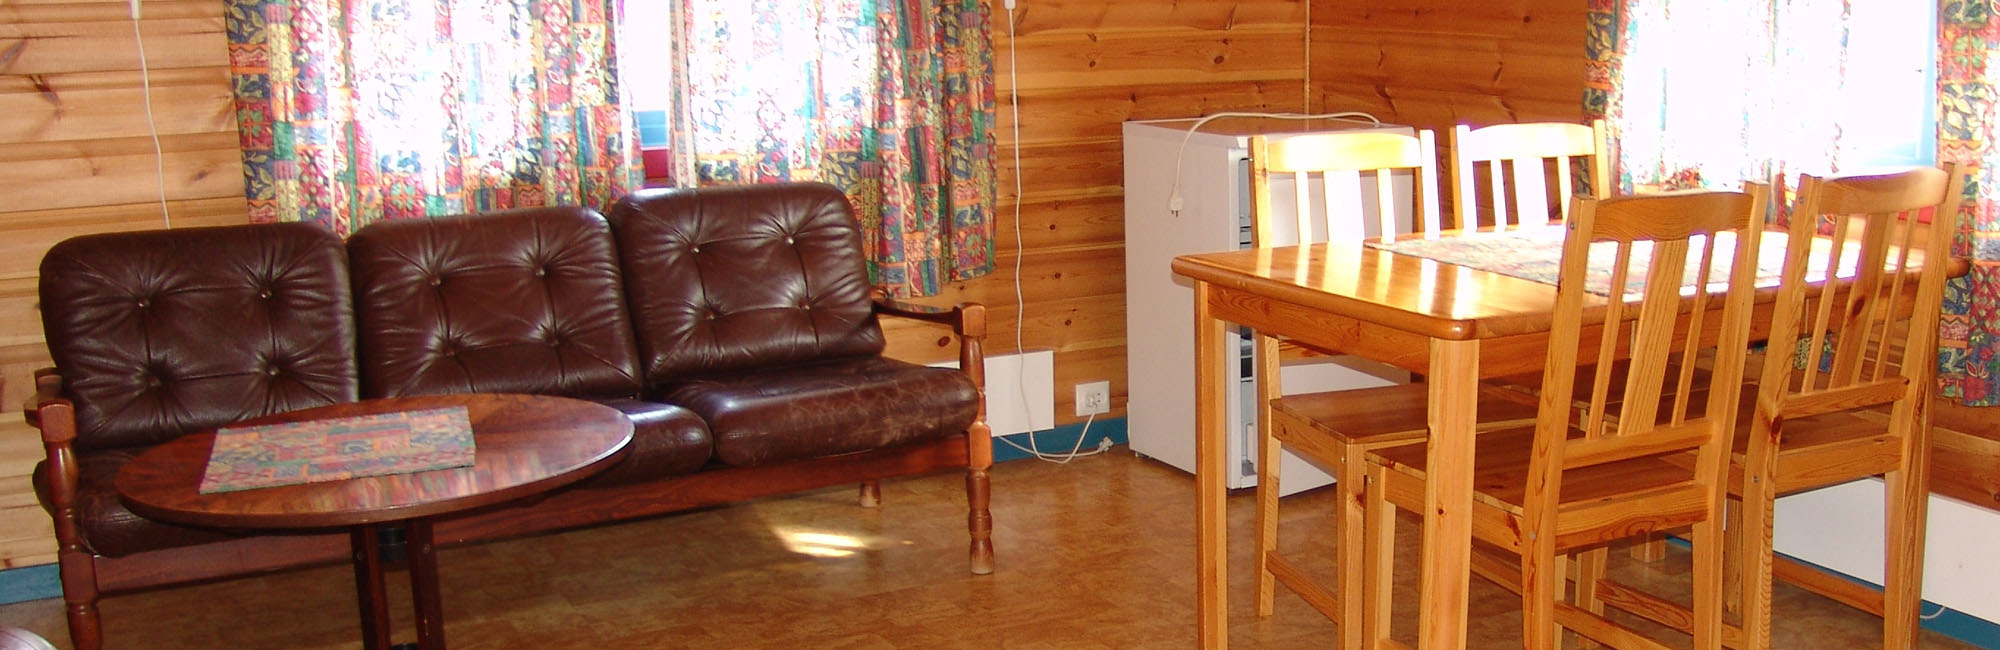 Lonin Gård & Camping - stue